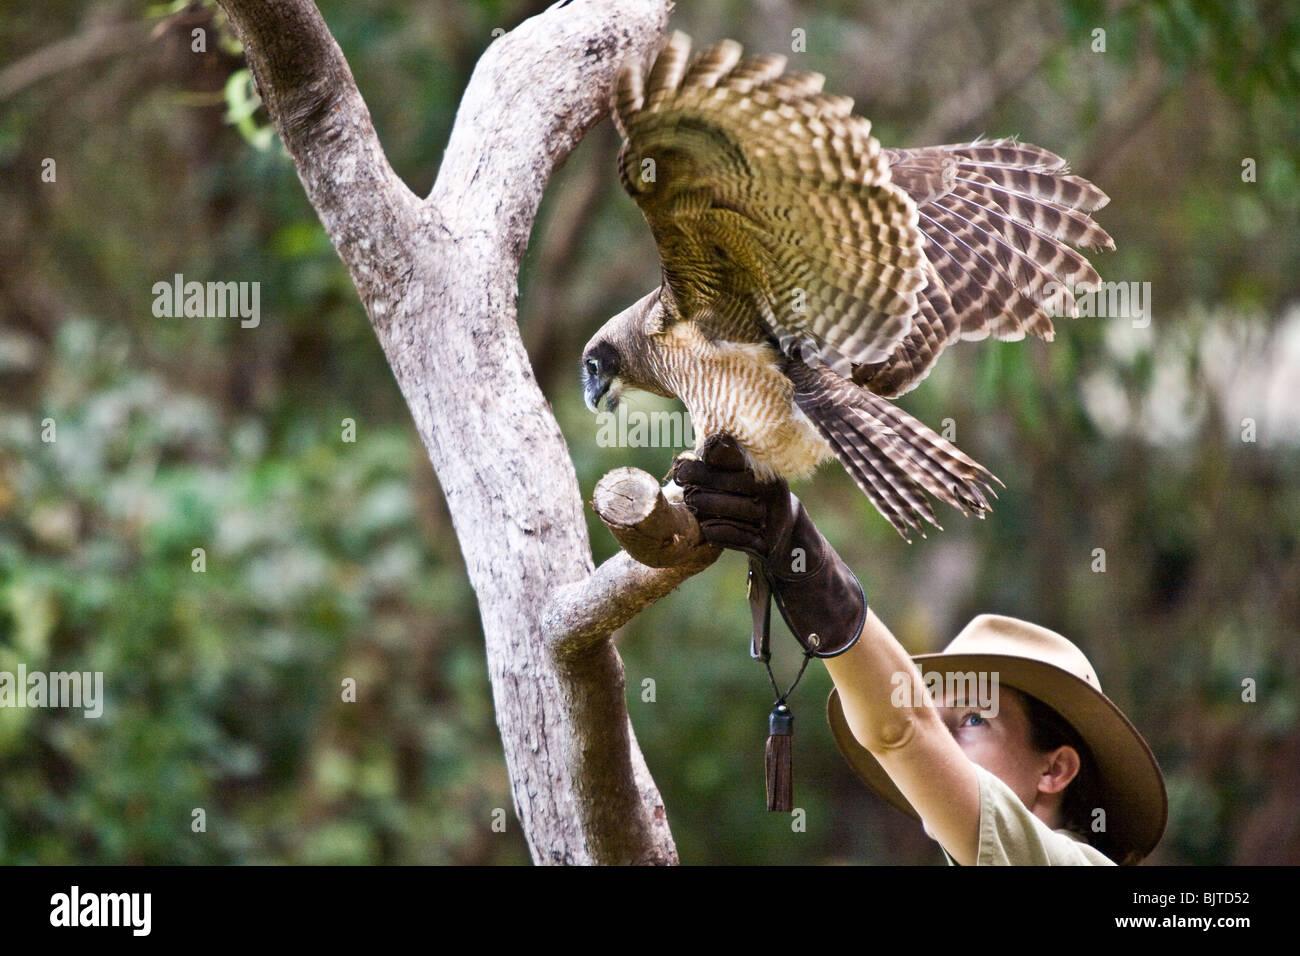 Erfahrene Handler anzeigen Australiens prächtigen Greifvögel Birds Of Prey Show am Flight Deck Territory Stockbild